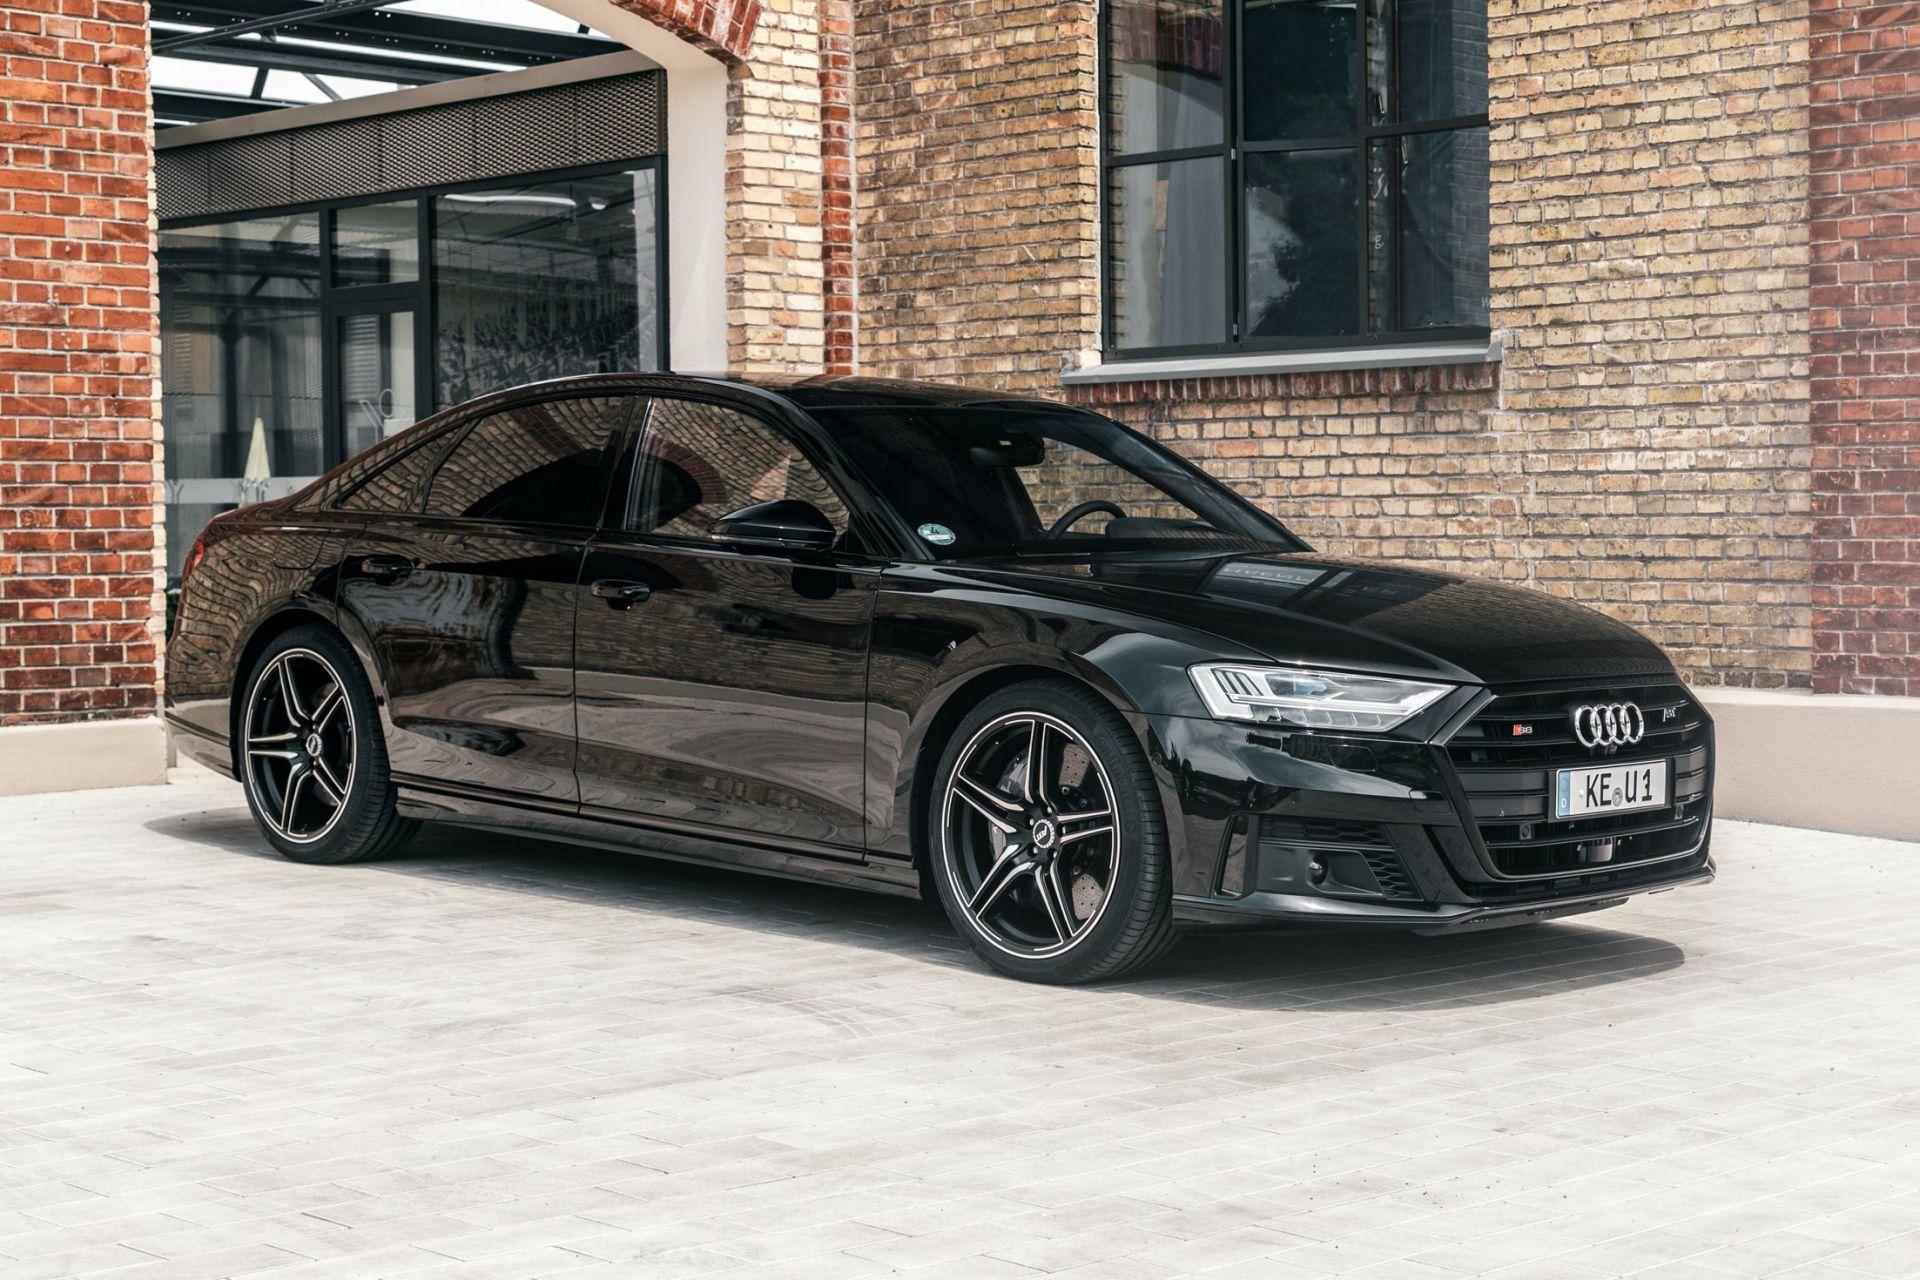 Audi-S8-by-ABT-Sportsline-1-1